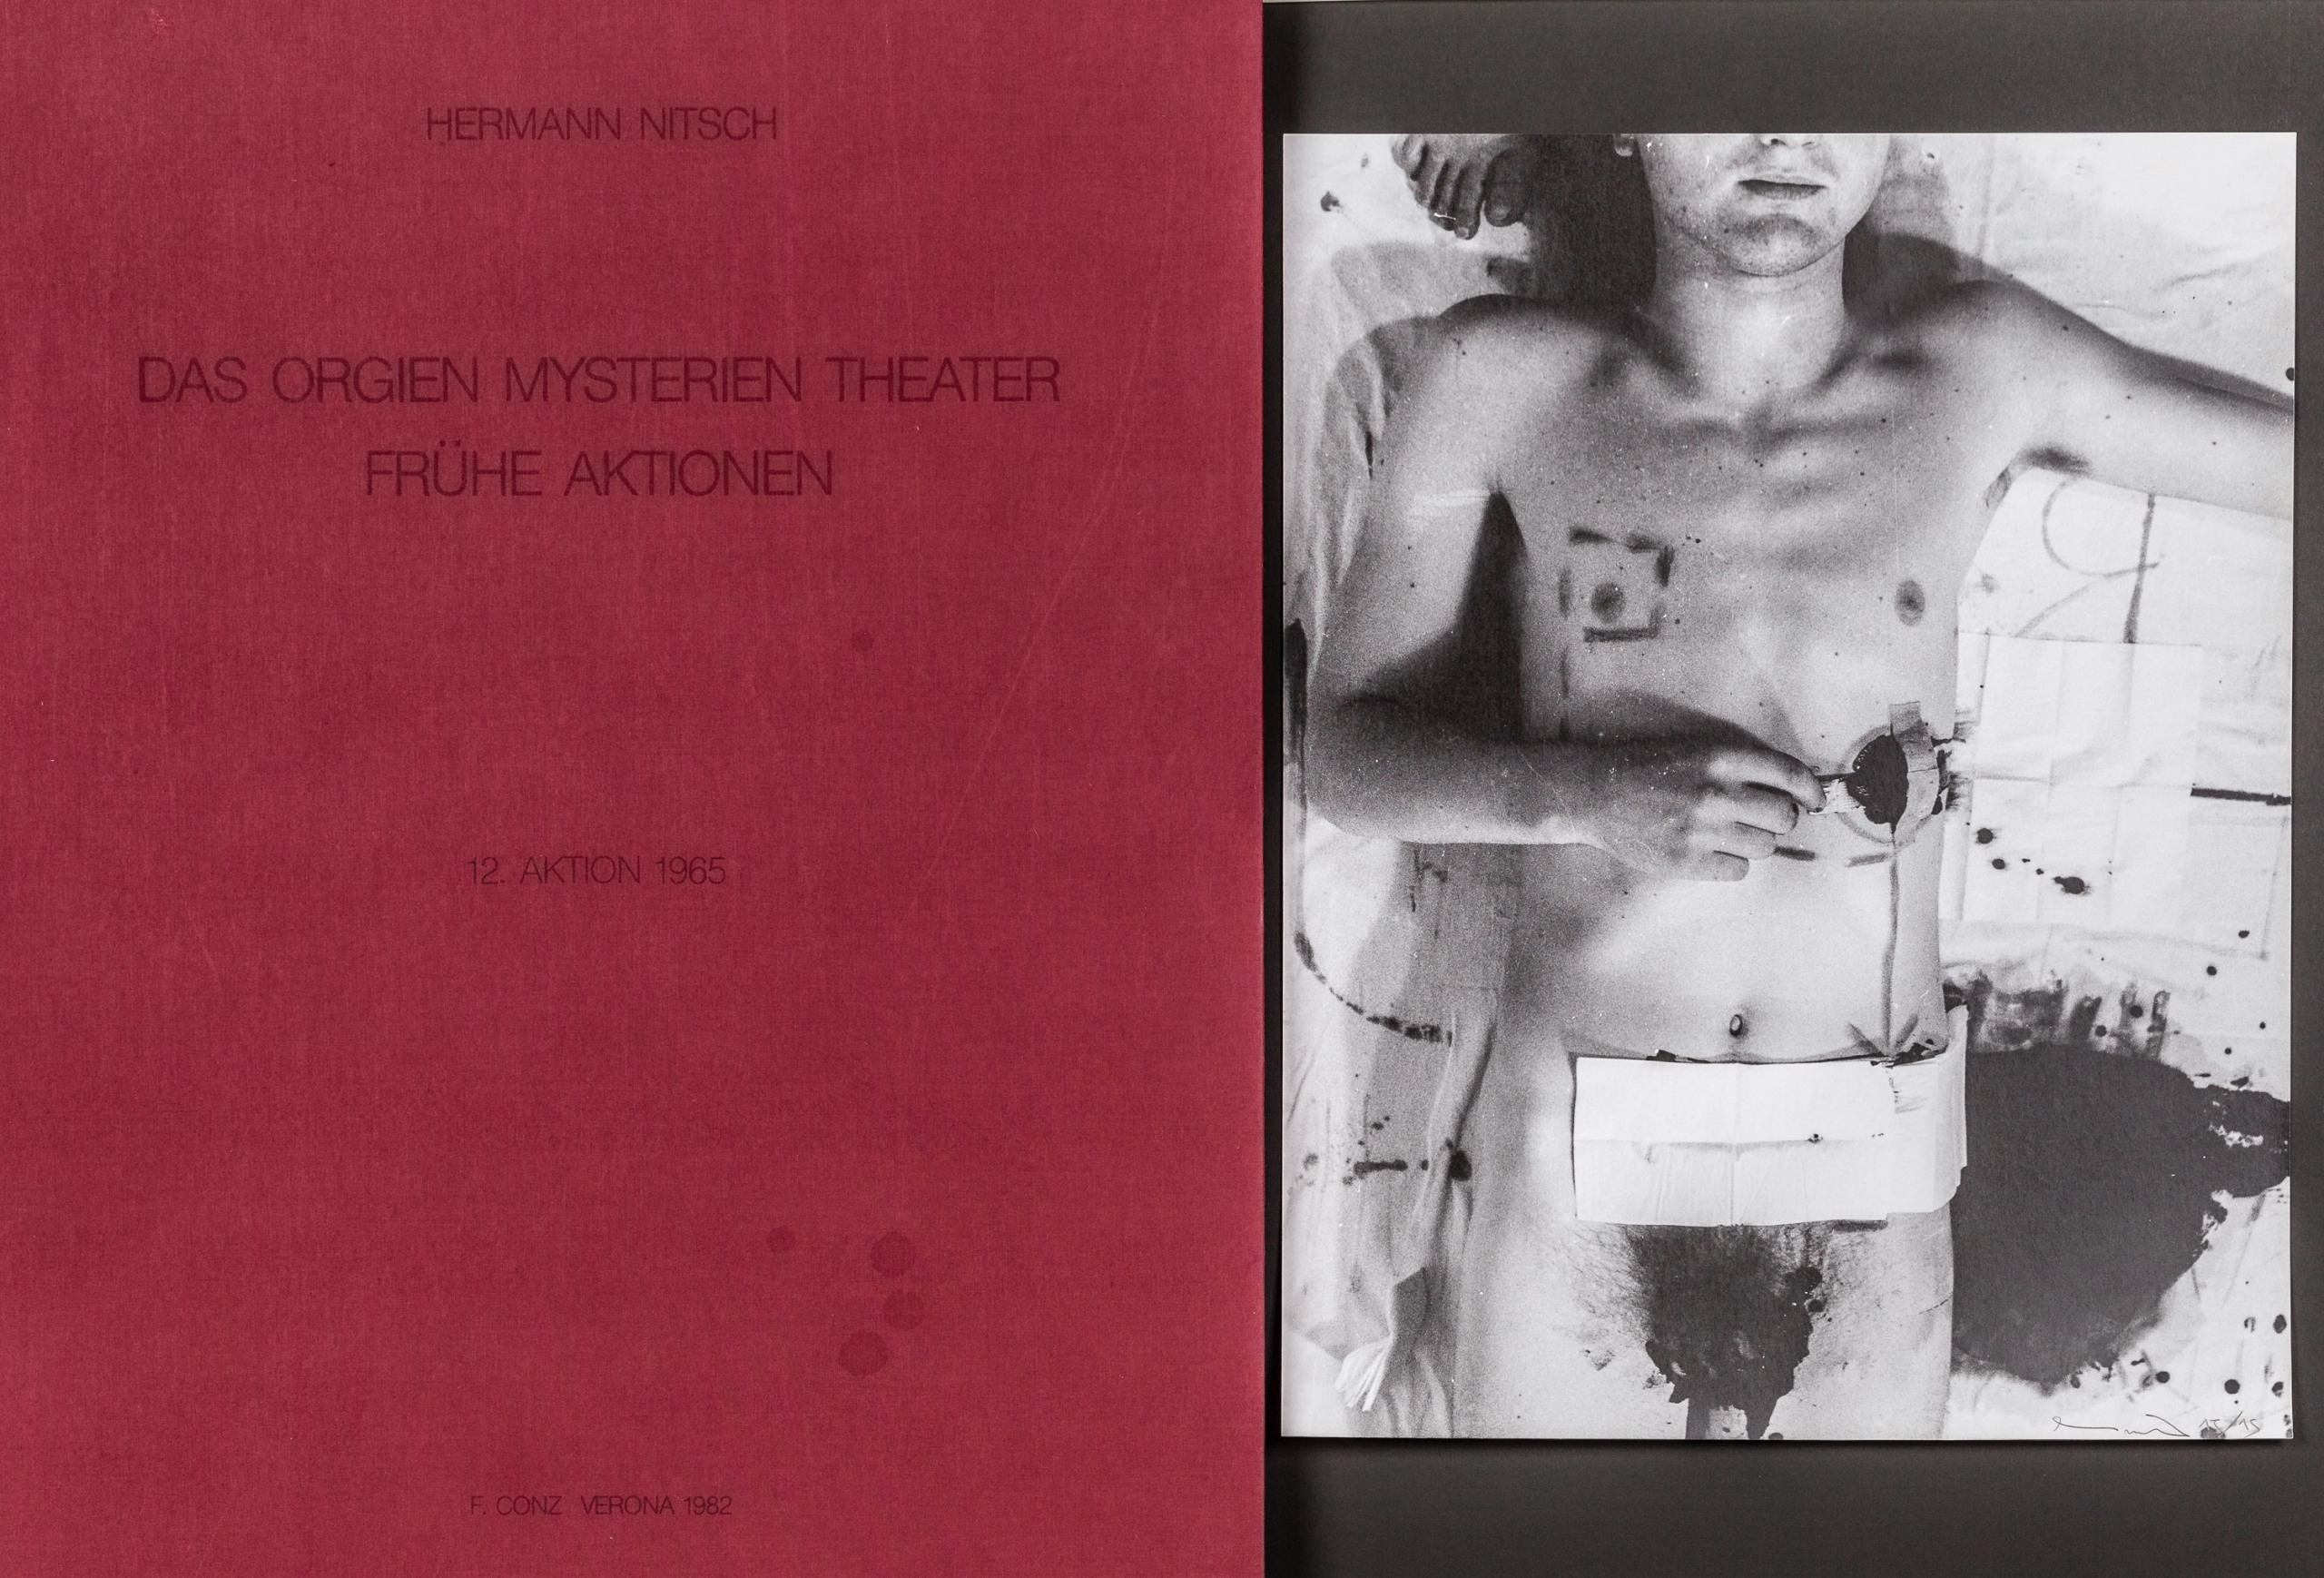 Hermann Nitsch, Das Orgien Mysterien Theater